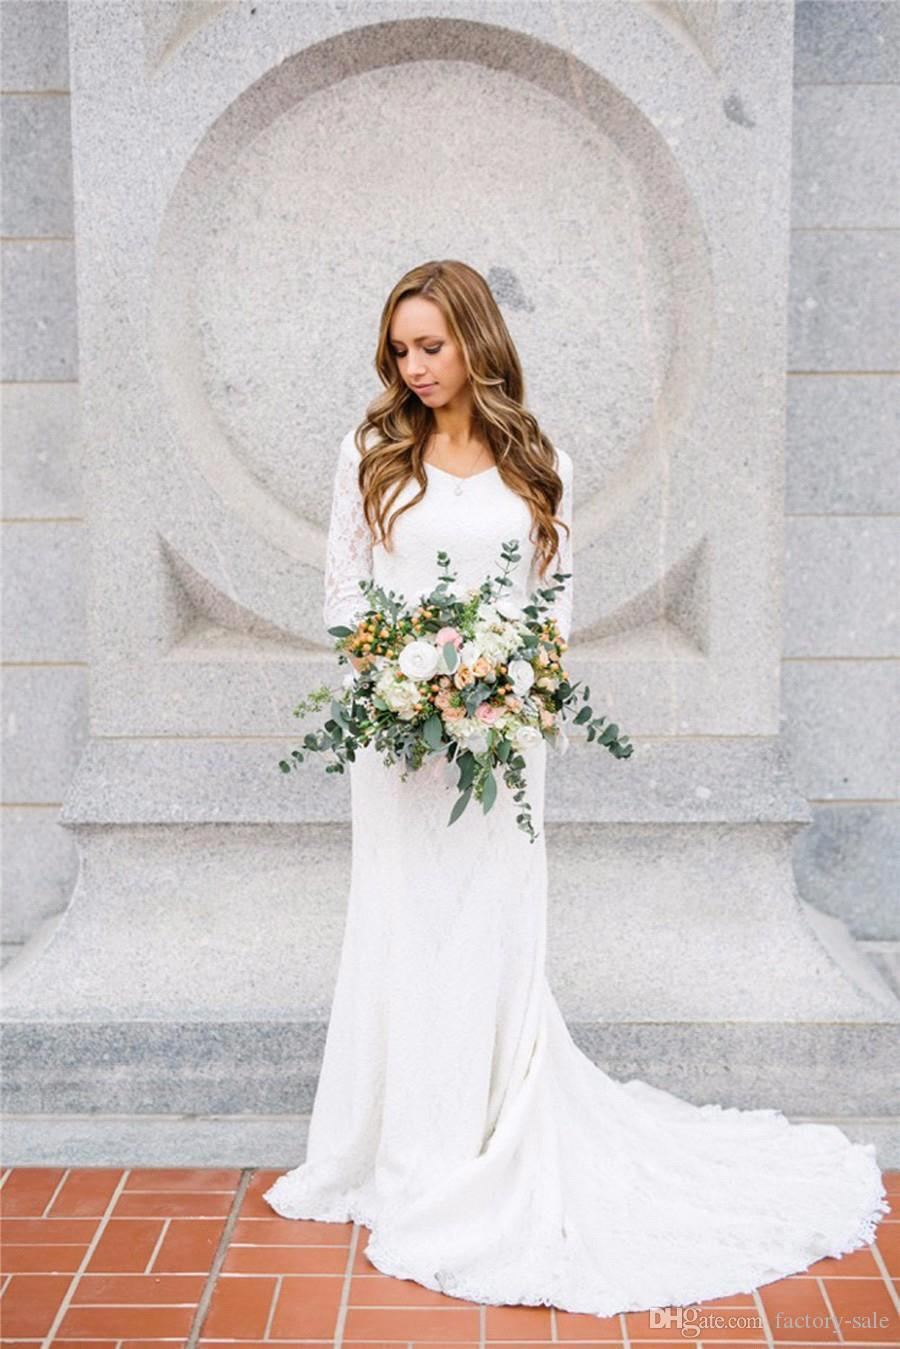 Wedding Modest Vintage Dresses O Neck mangas compridas A Linha Bohemian Lace Chiffon Camo vestidos de casamento vestidos de noiva BA4690